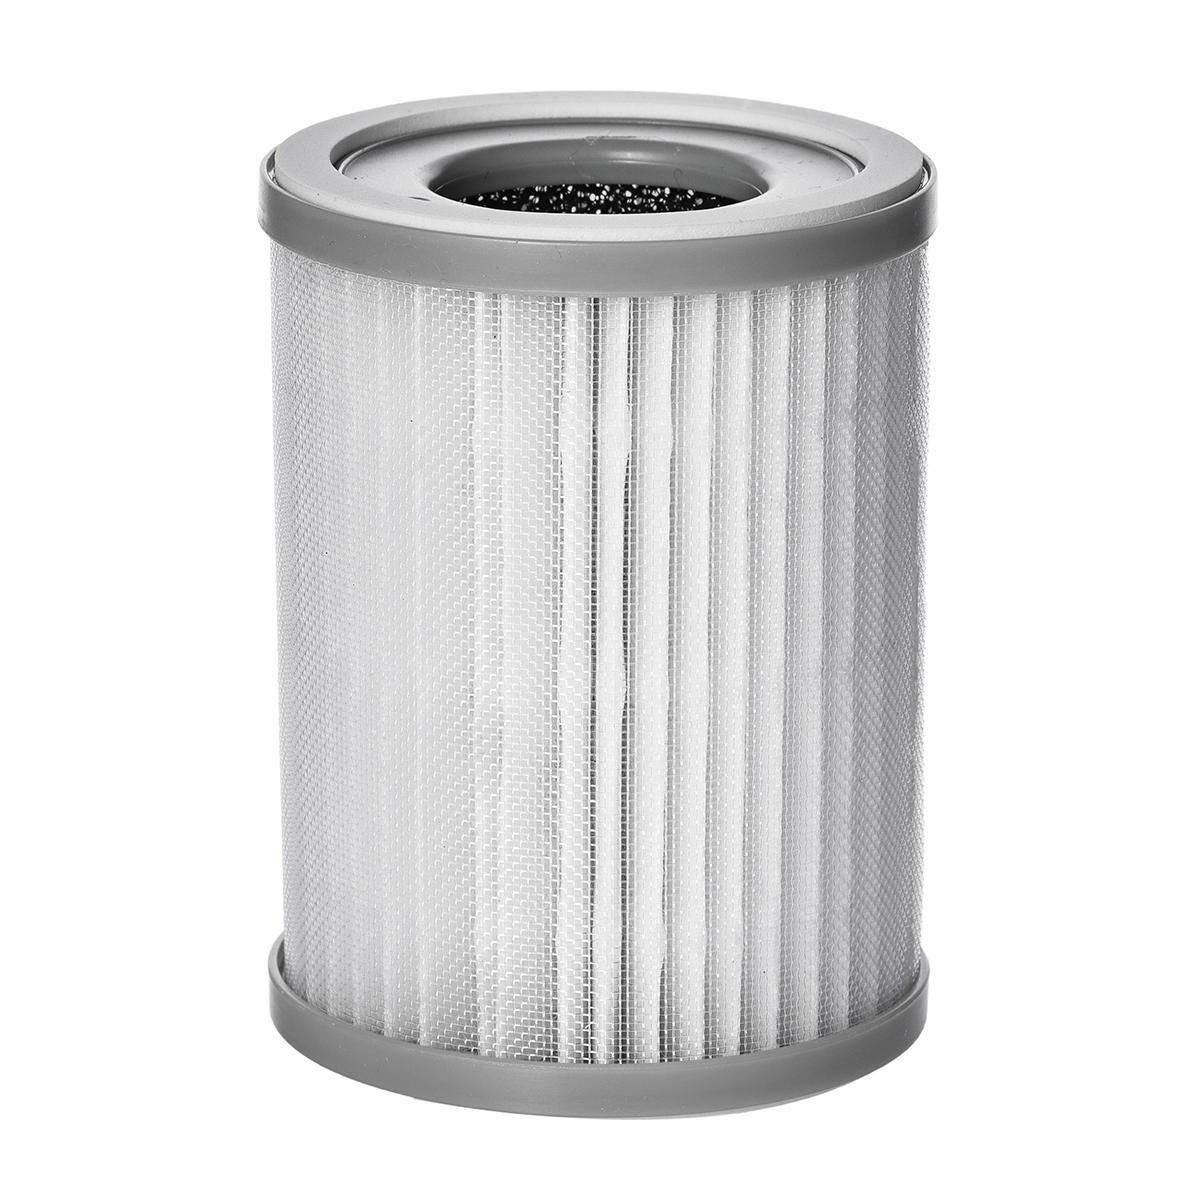 Air Purifier Filter HEAP Air Filter Part Replacement Accessories For Fresh Air Purifier Cleaner